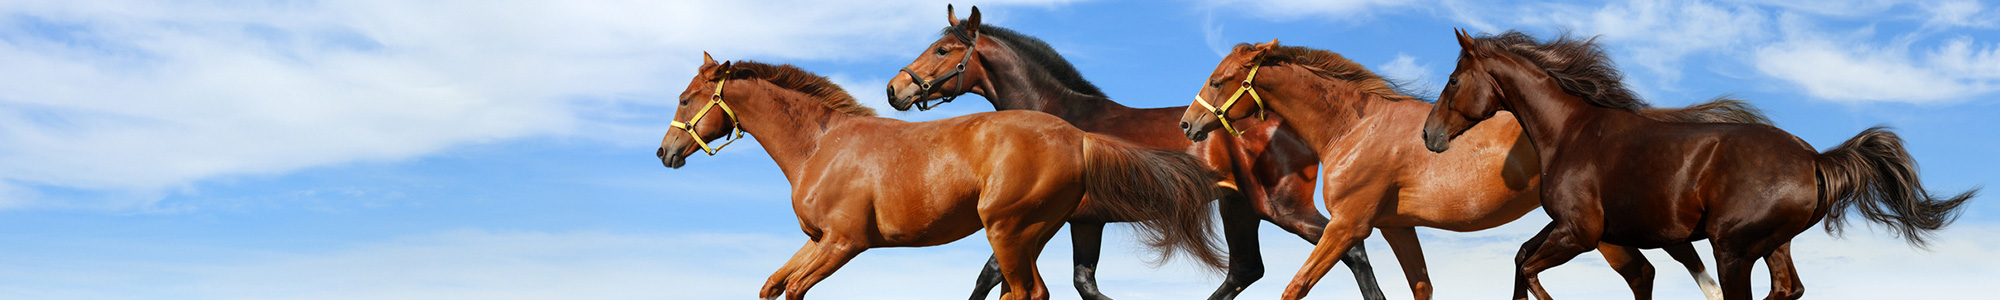 Suplementy (2) - Art-horse Sklep jeździecki